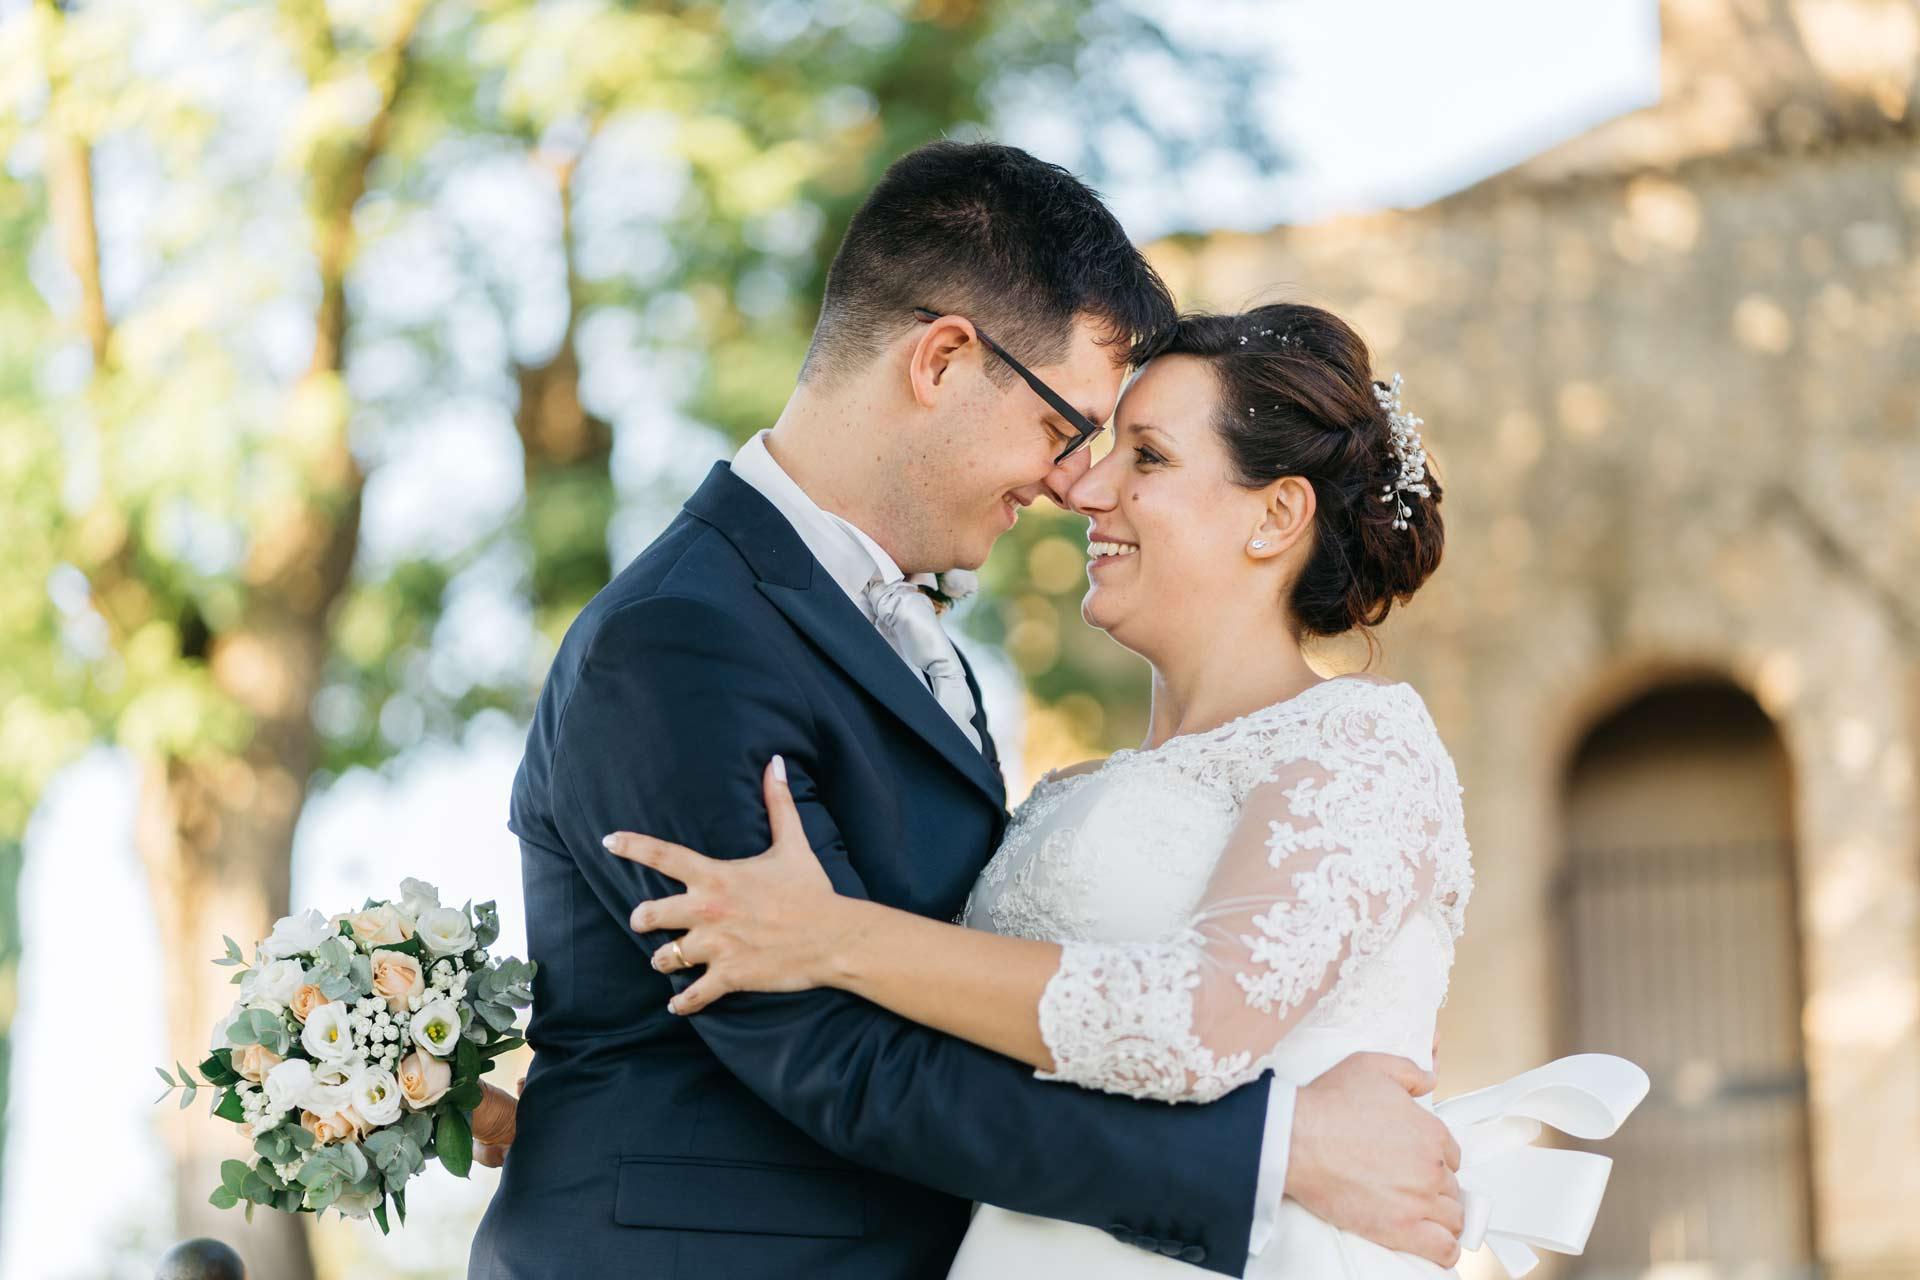 reportage-di-matrimonio-sant'antimo-s&gjpg